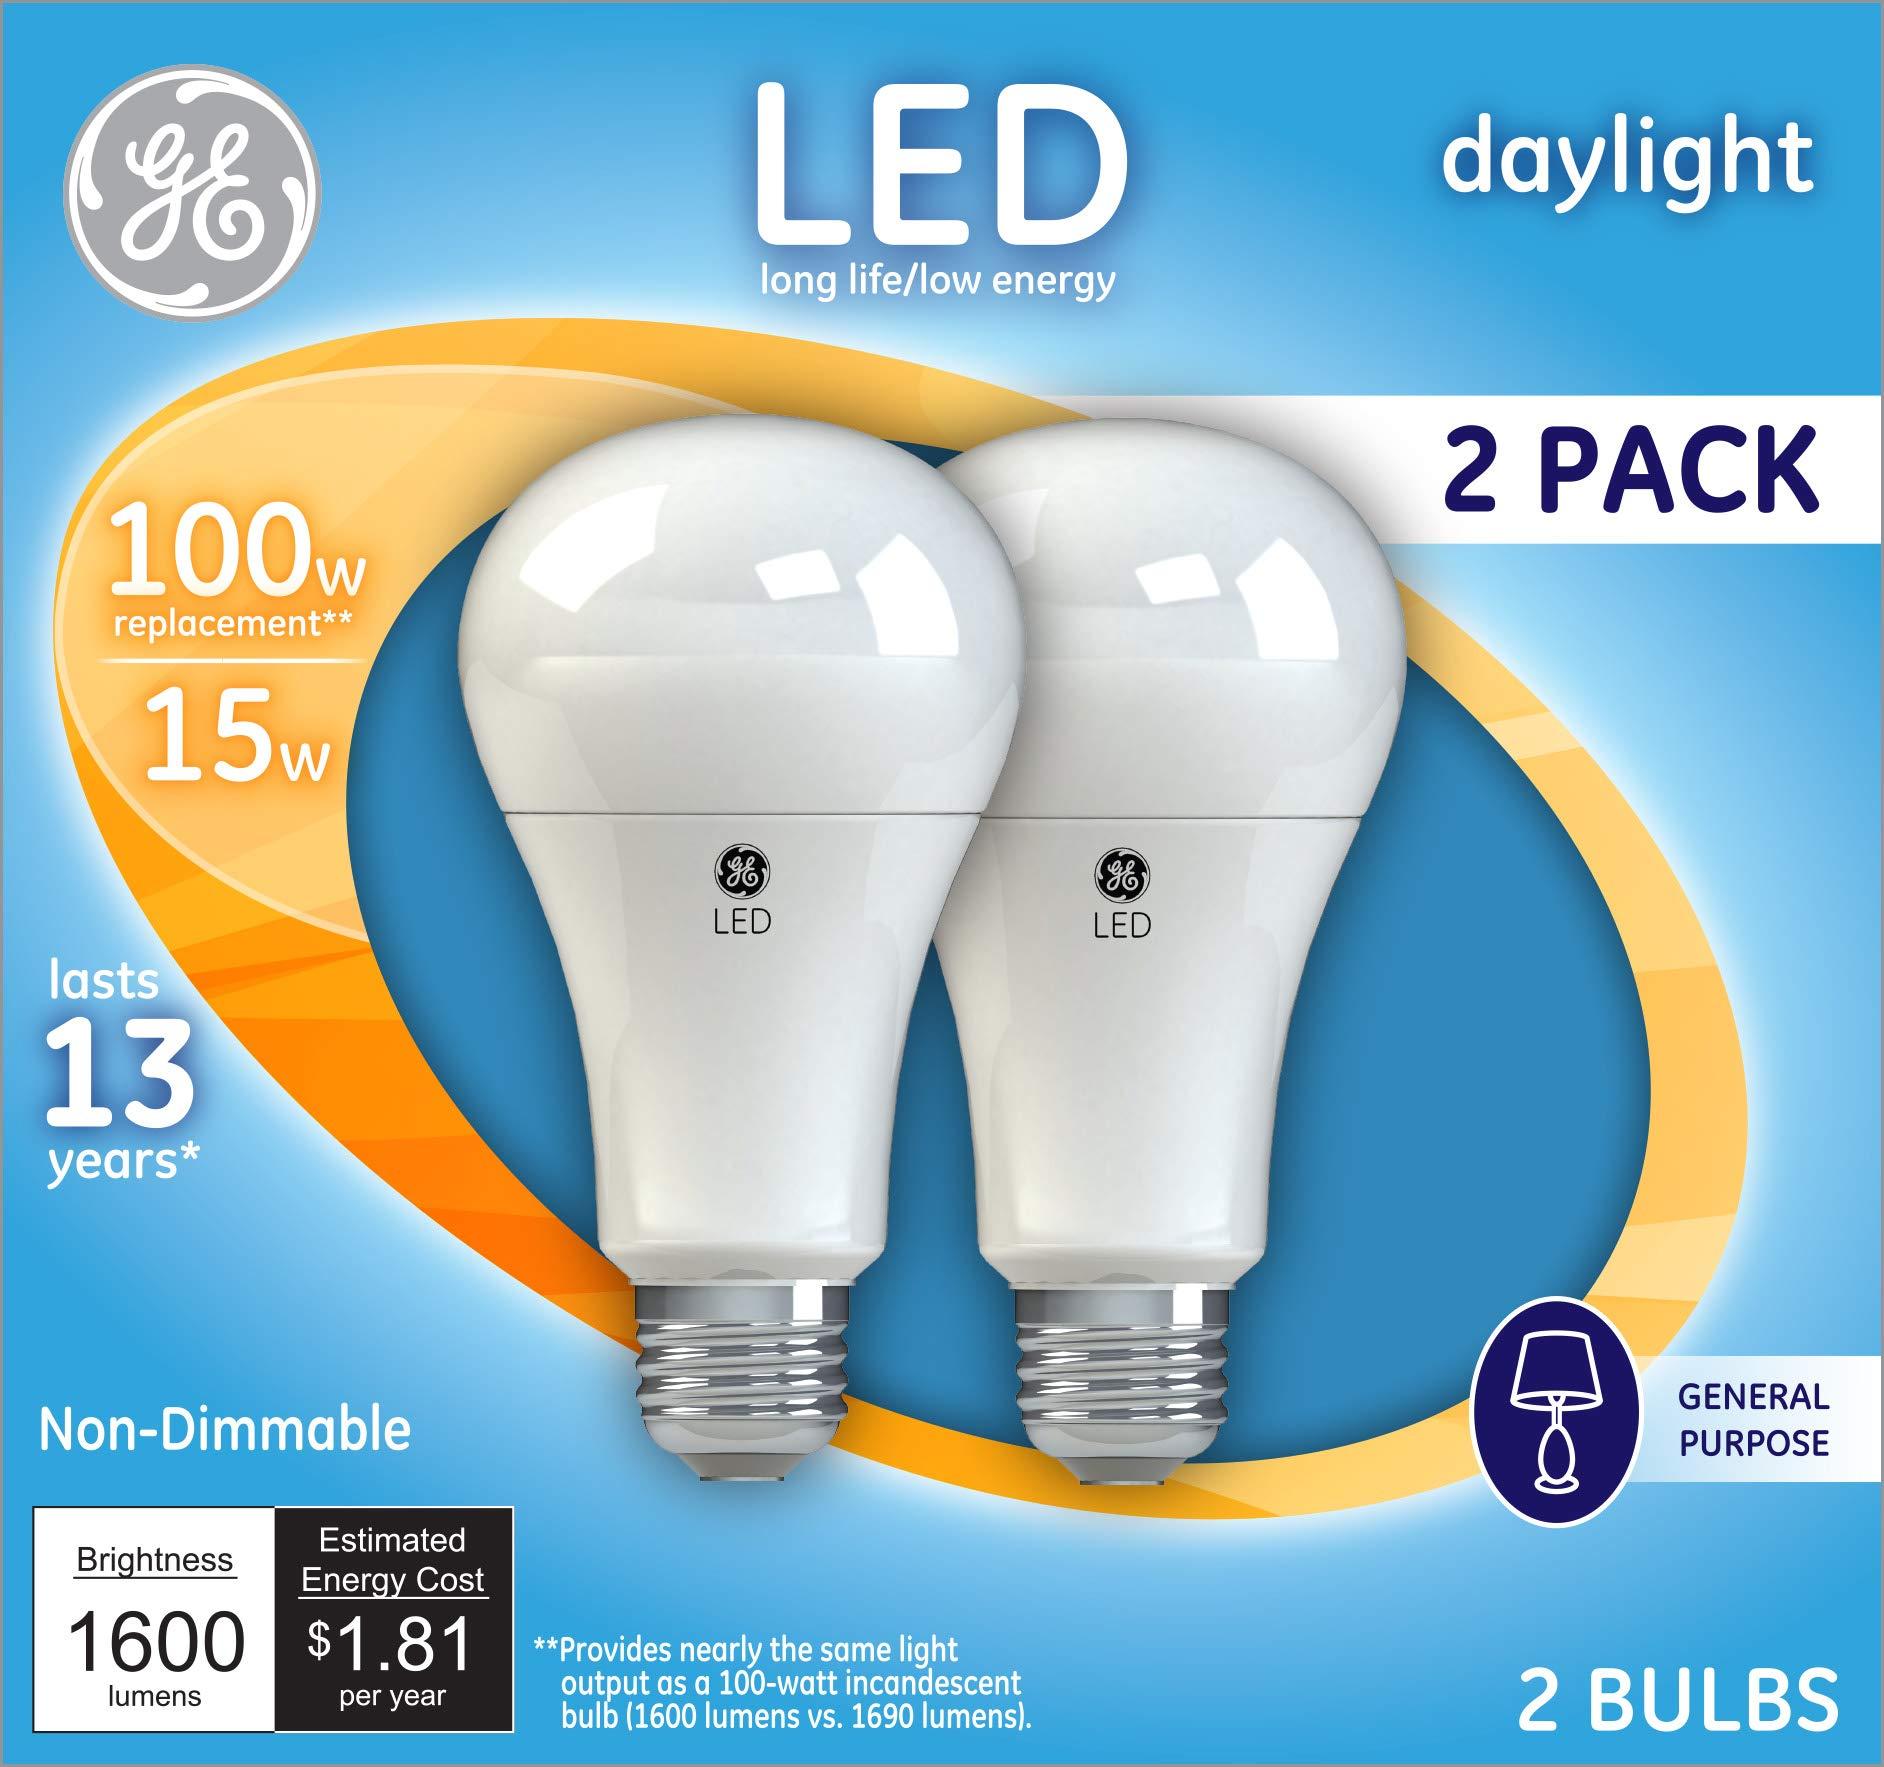 Ge Daylight 100 Watt Replacement Led Light Bulbs General Purpose A21 Bluish White Light Bulbs Amazon Com